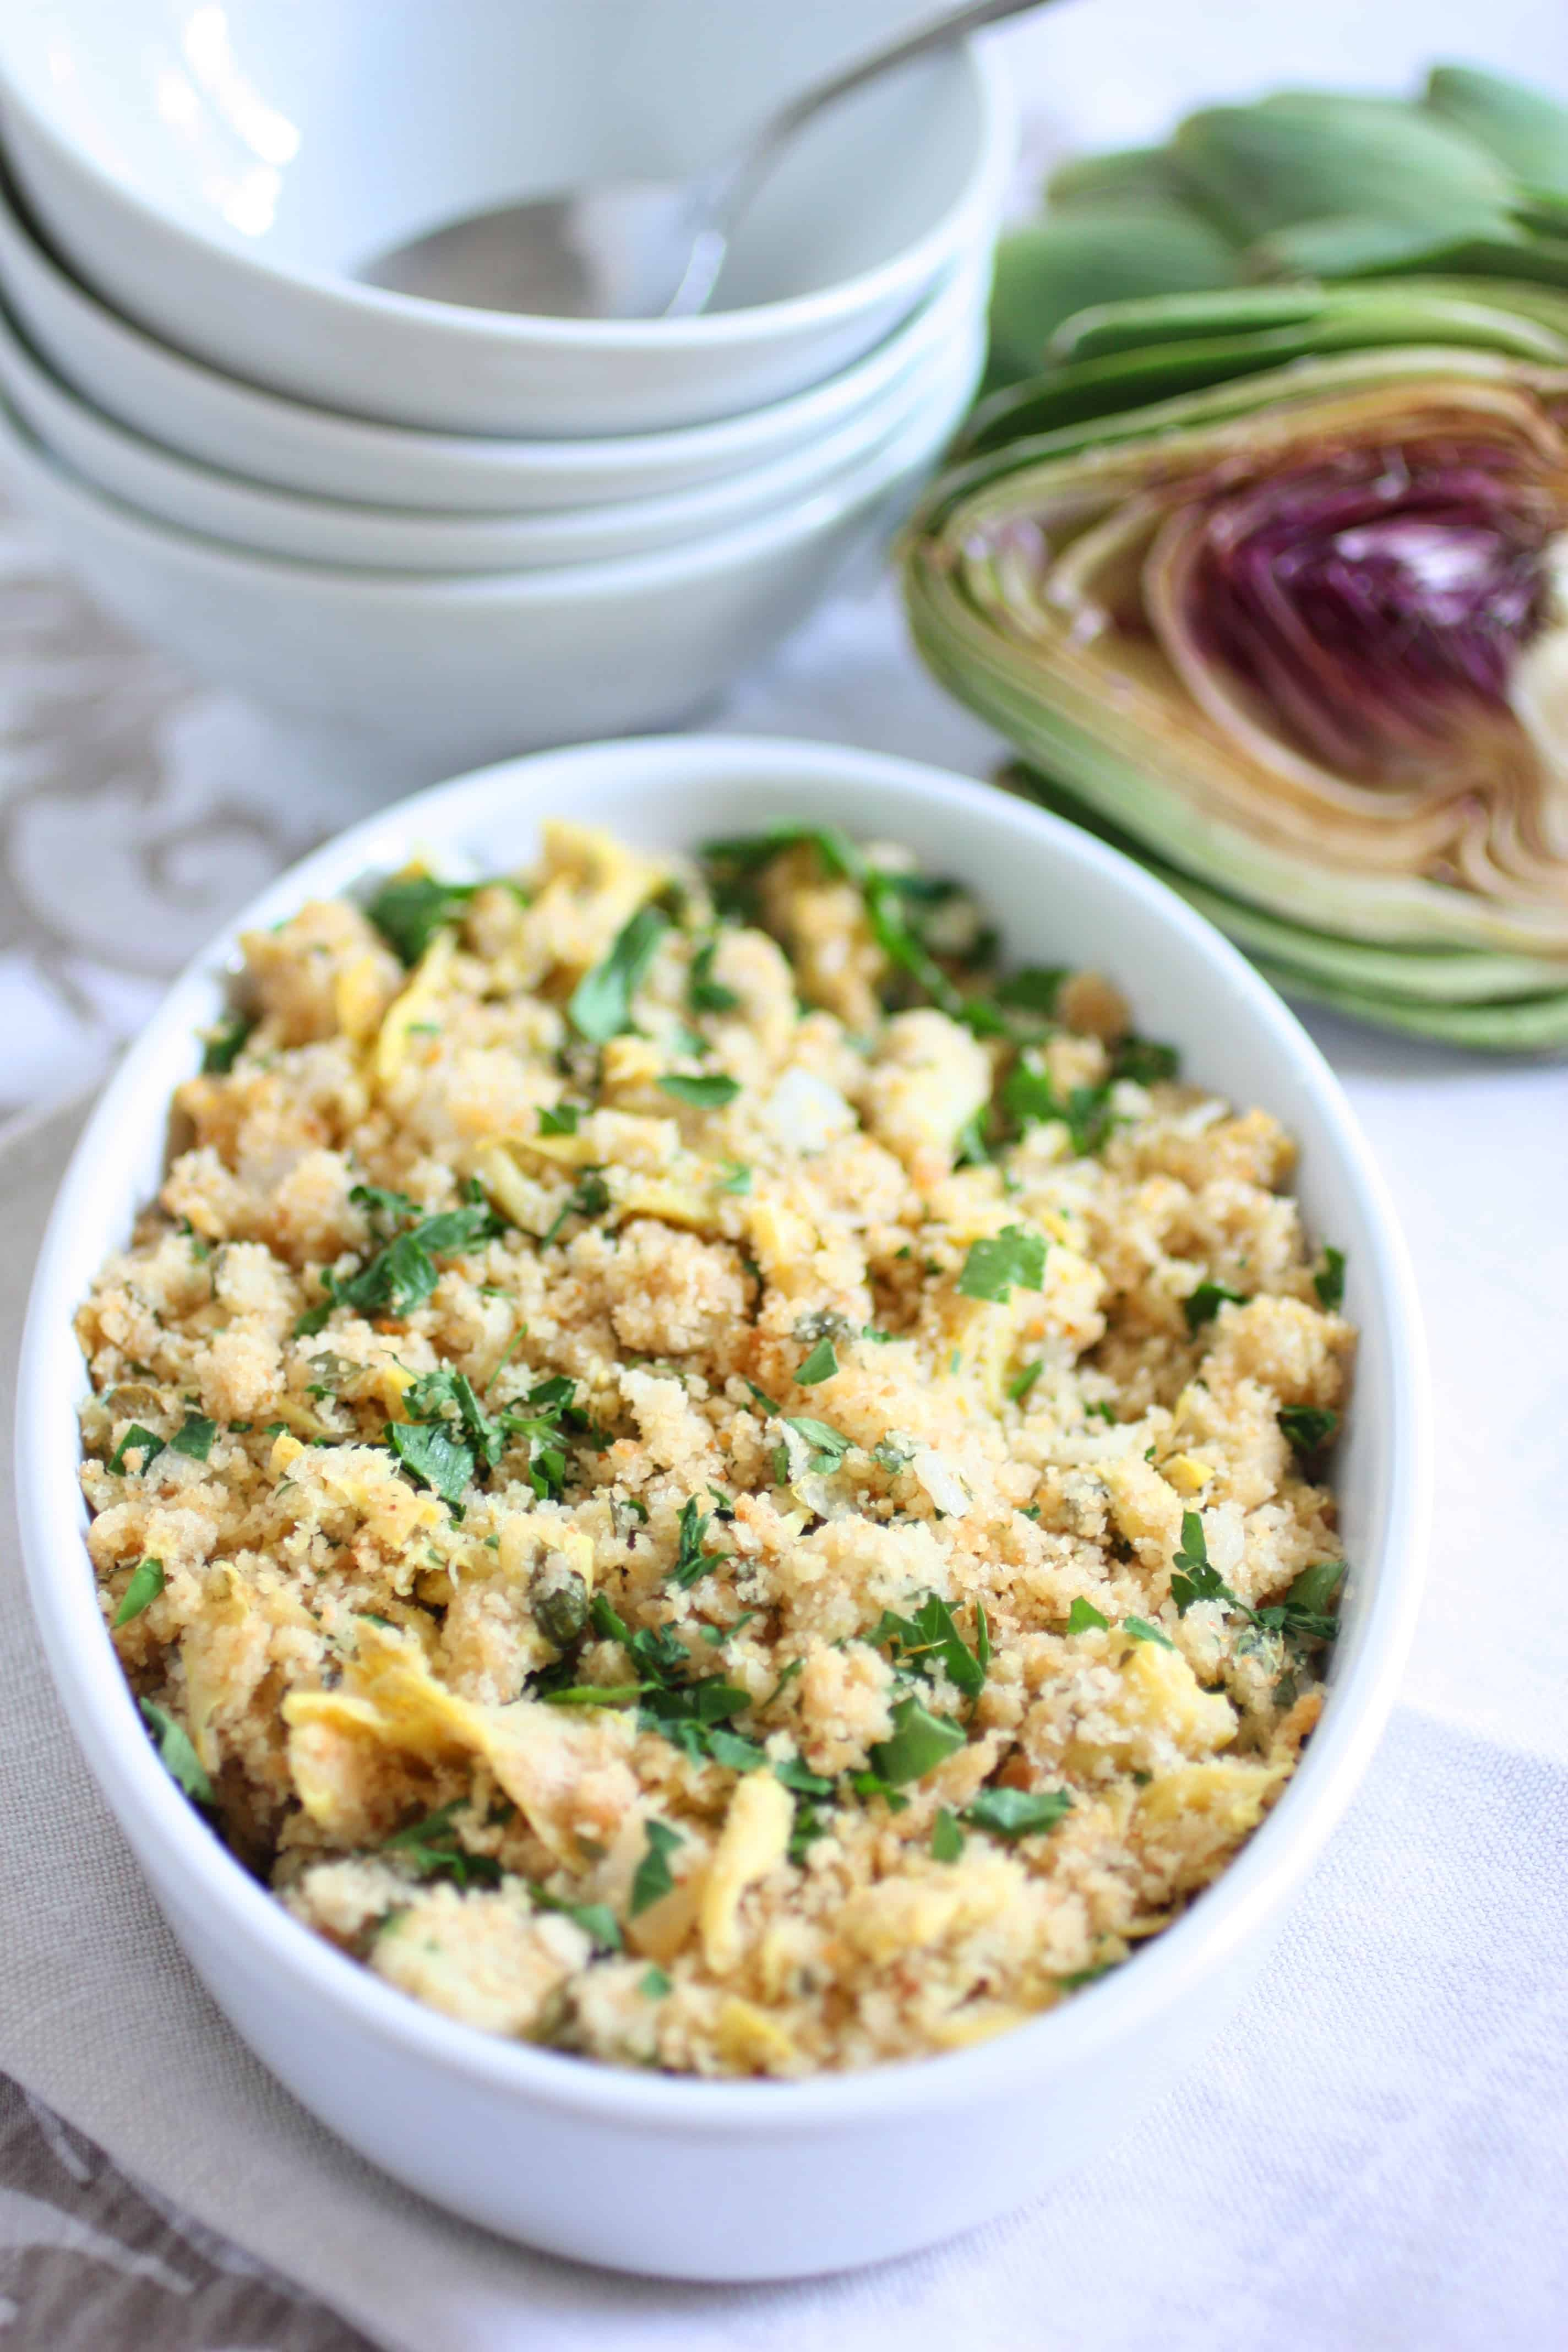 artichoke dish